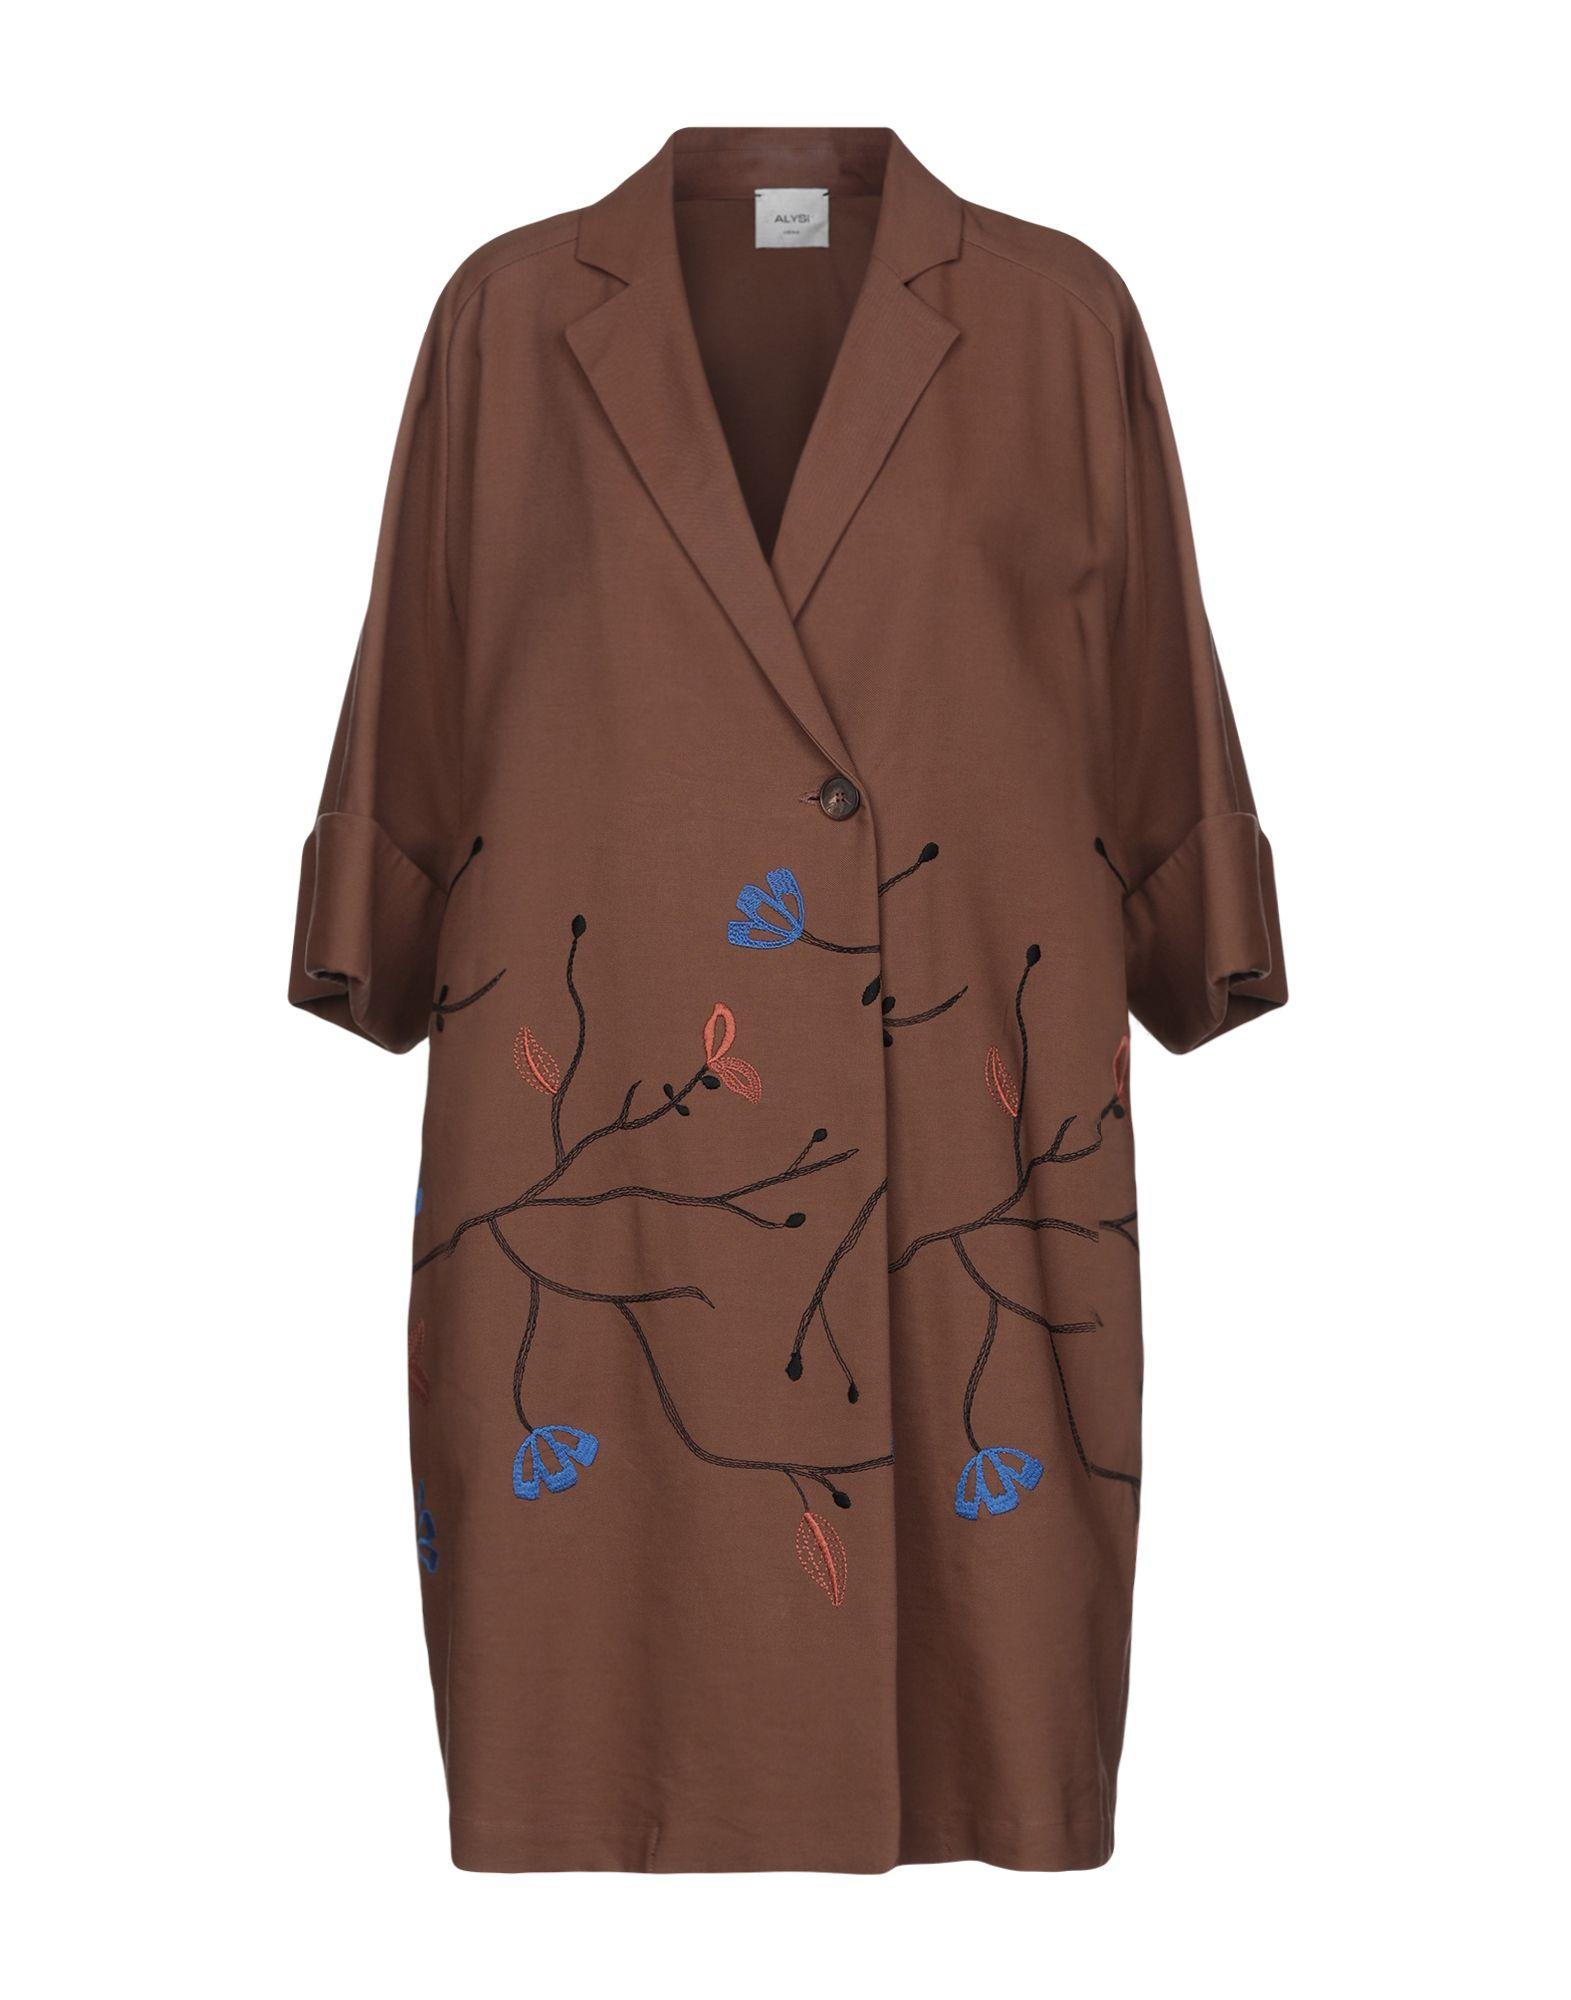 Jacket Jackets Alysi en Full Women Estados Yoox Unidos 41841158la en Length línea w1OEqIaWOx